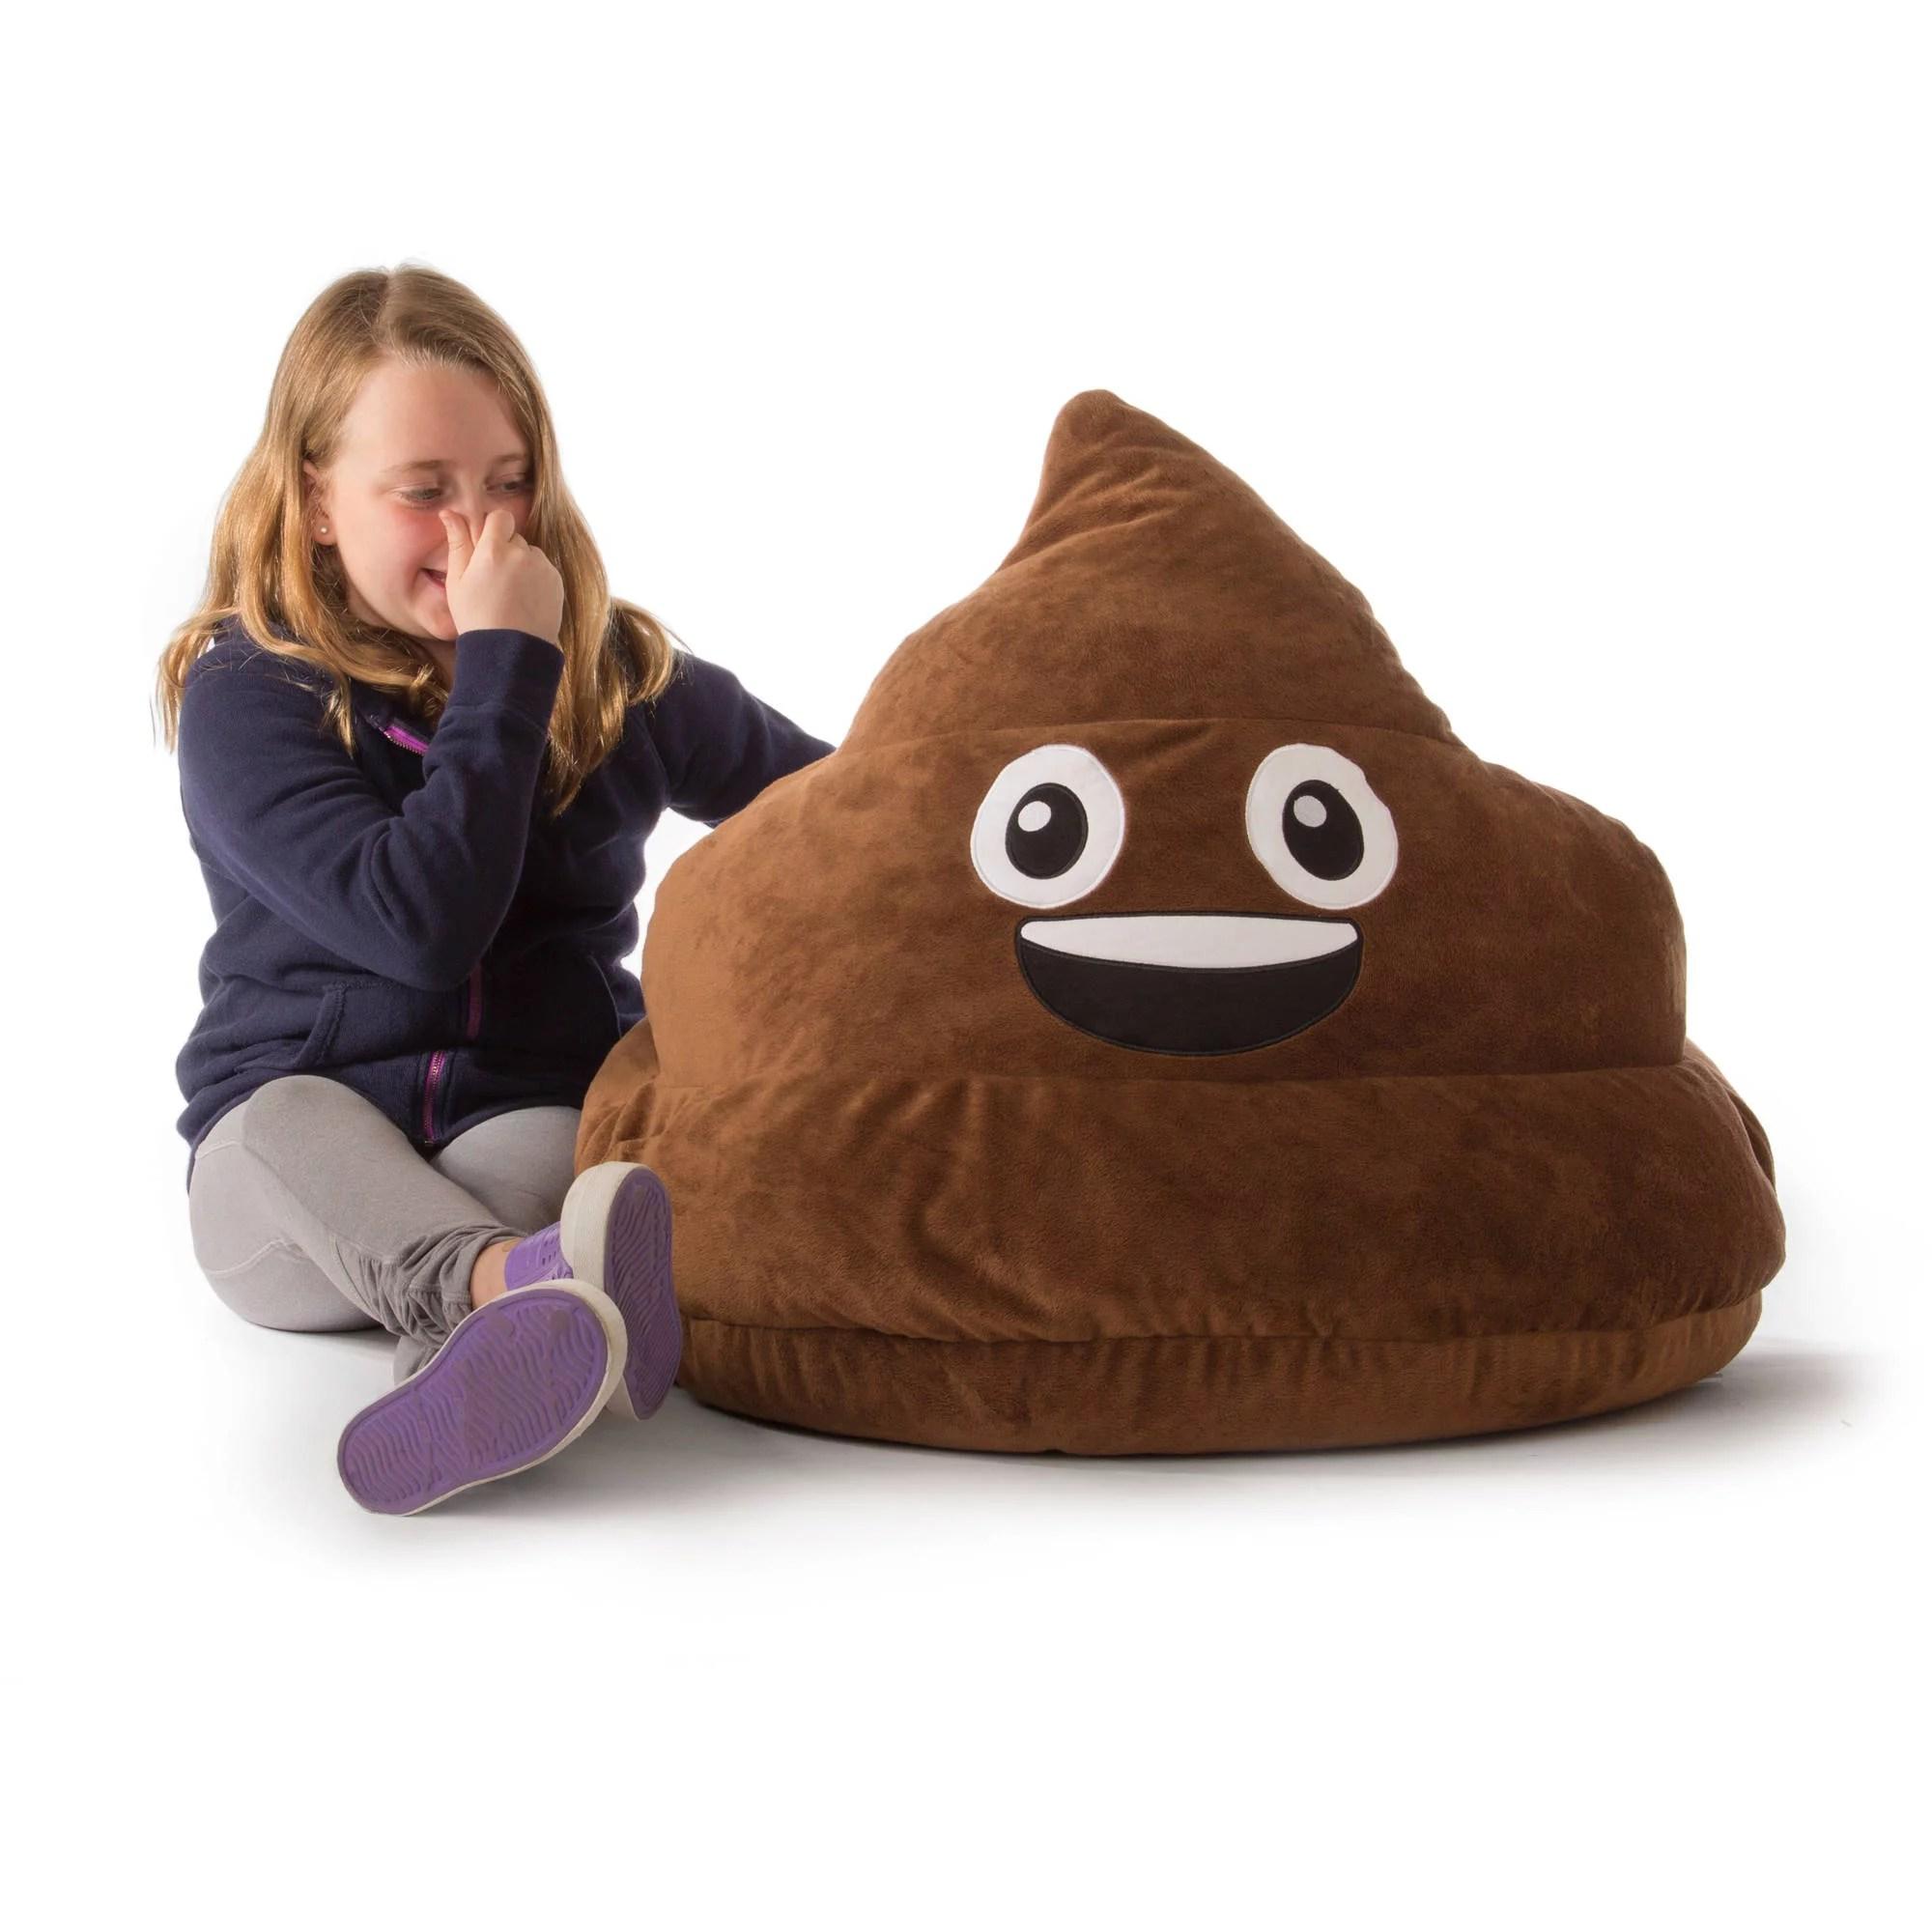 Emoji Emoticon Bean Bag Soft Chair Comfortable Sofa Seat